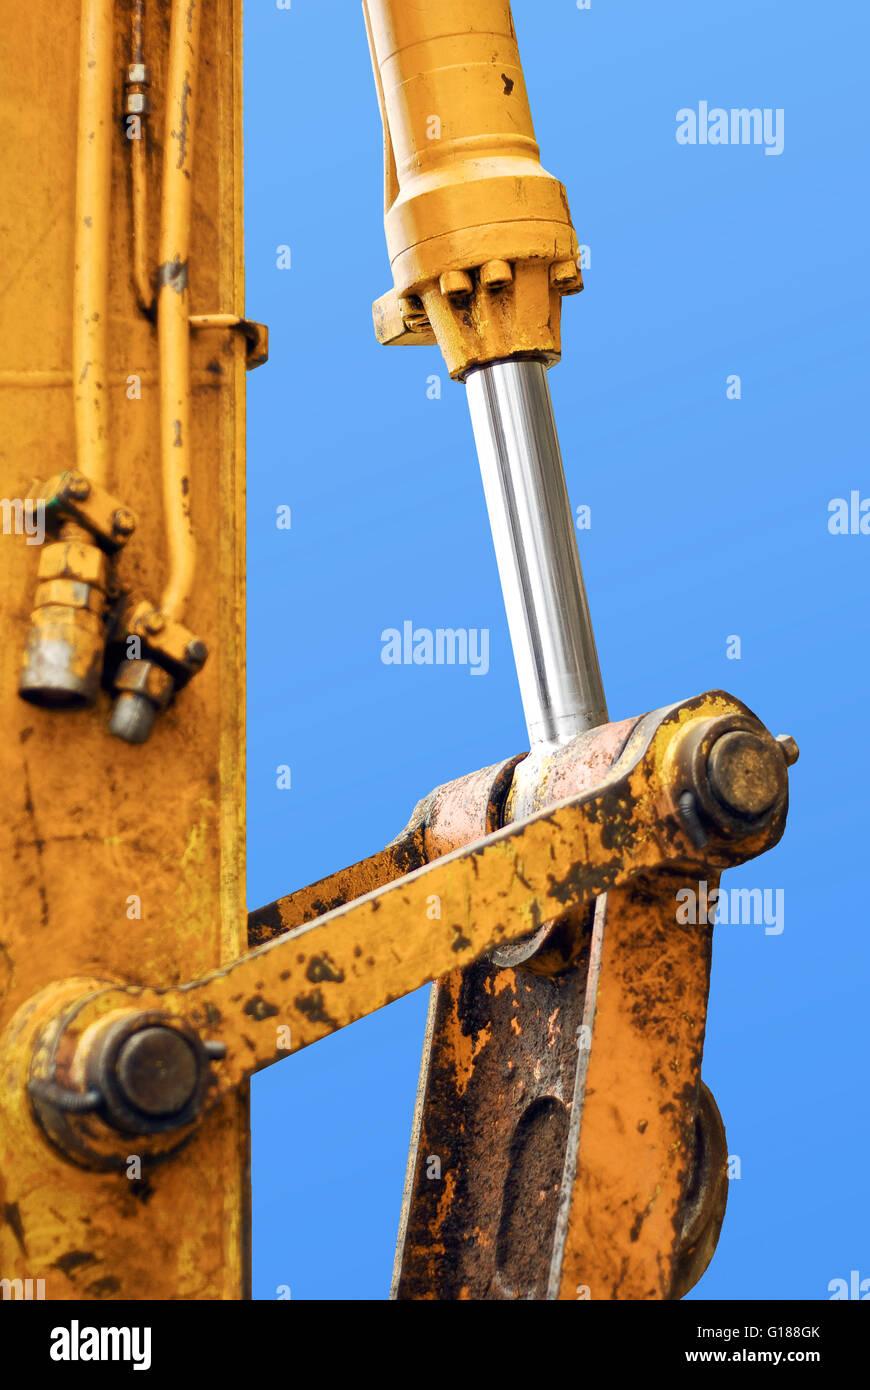 hydraulic piston - Stock Image